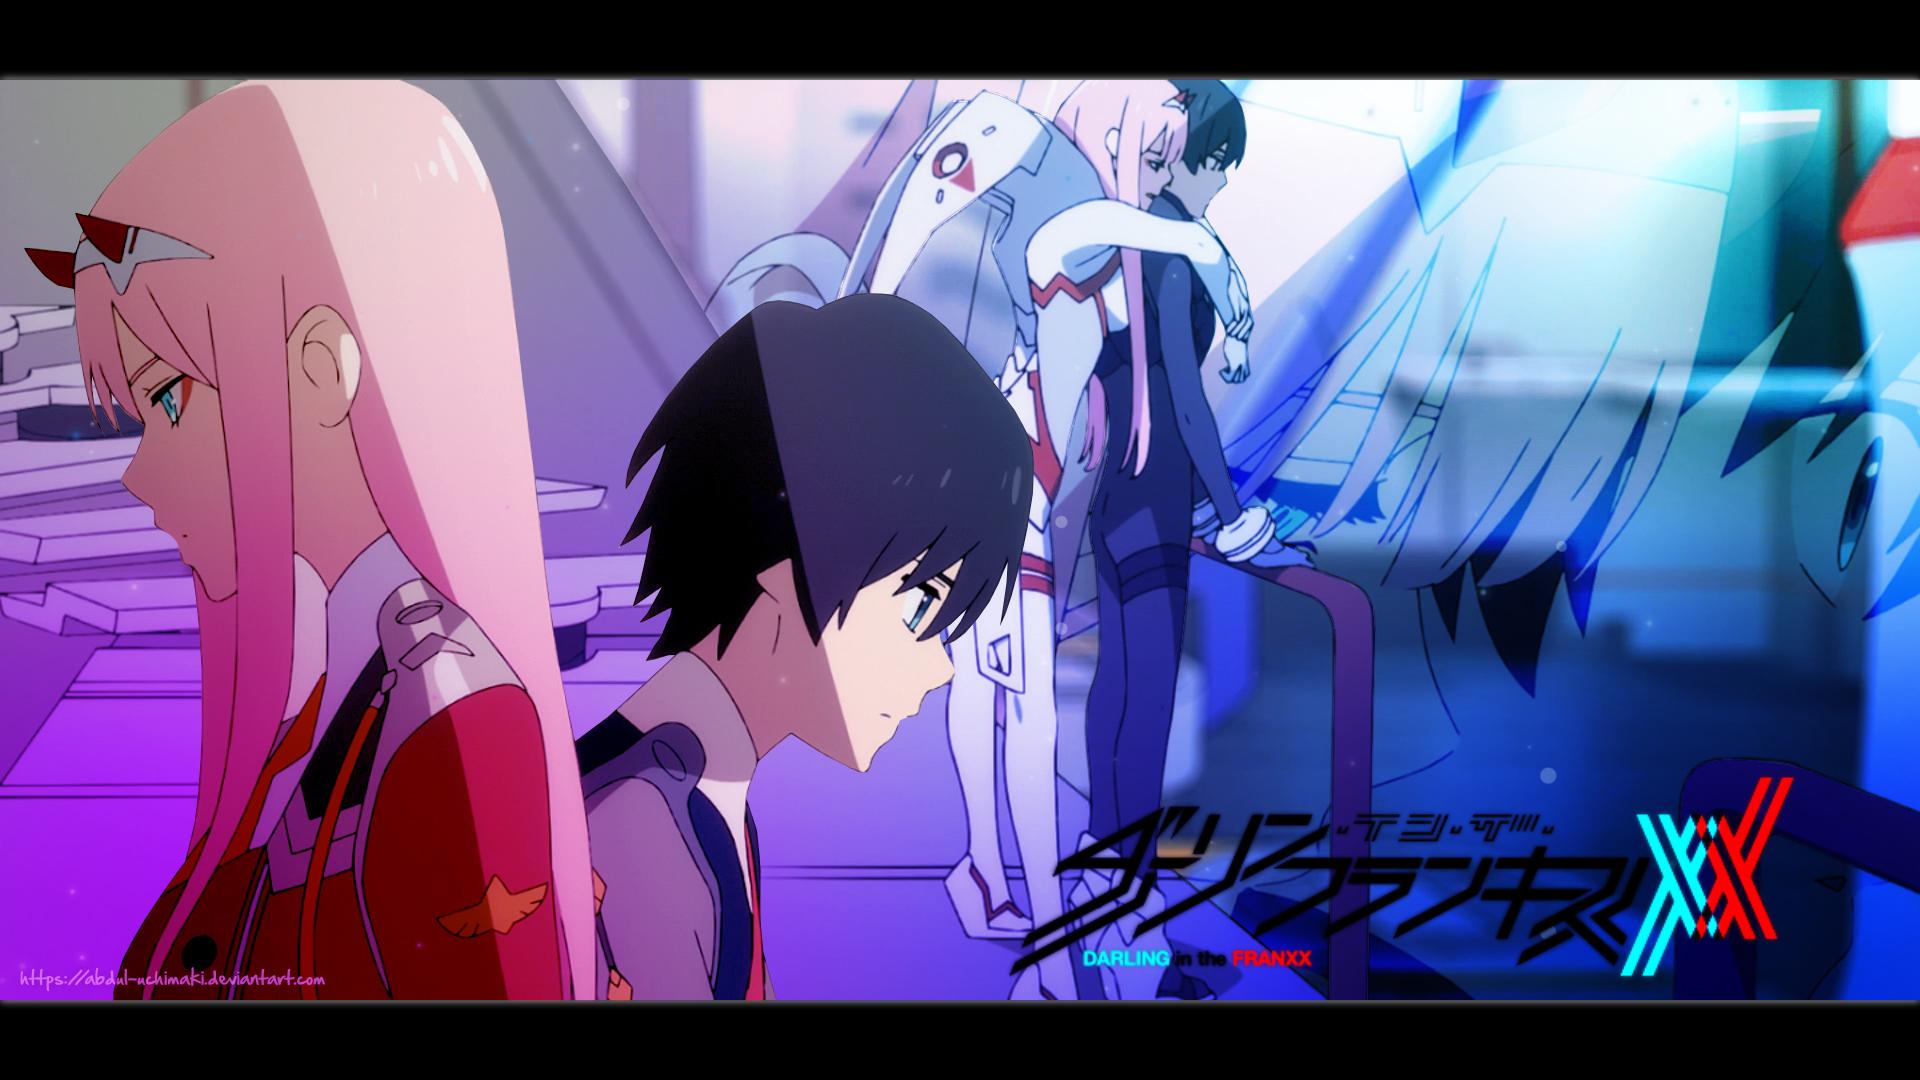 Darling In The Franxx Wallpaper 2293157 Zerochan Anime